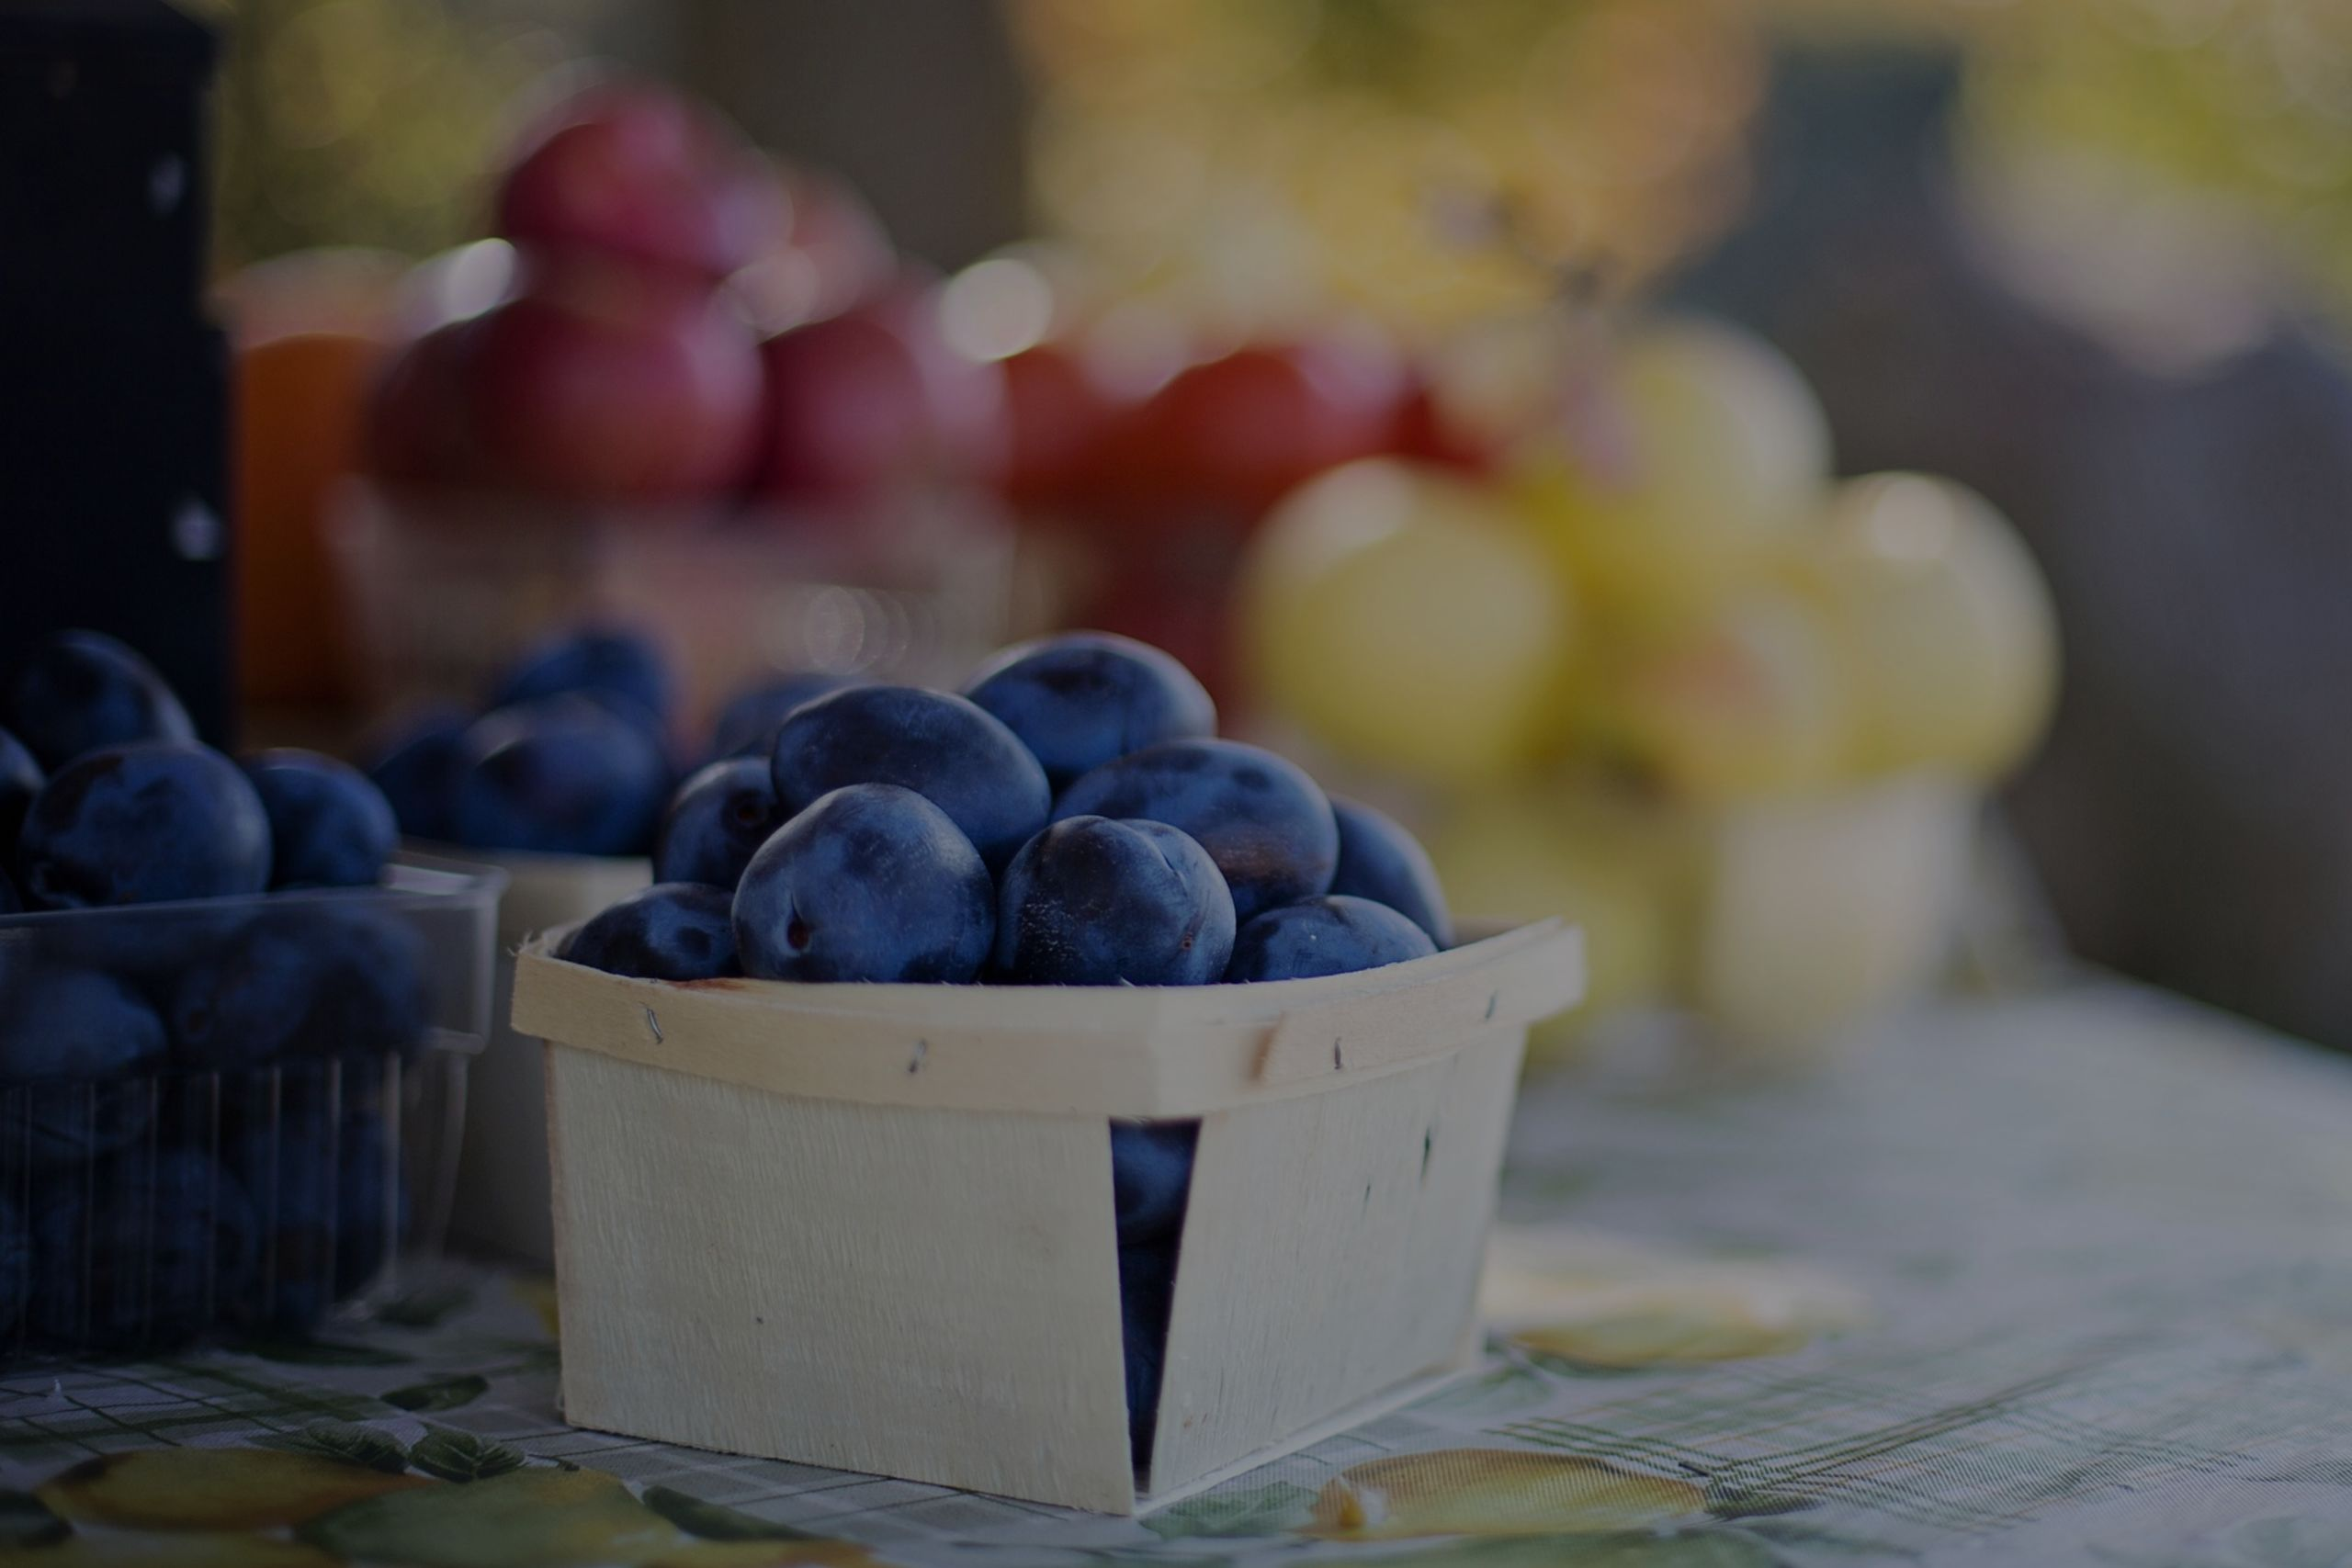 Bluffton Farmer's Market